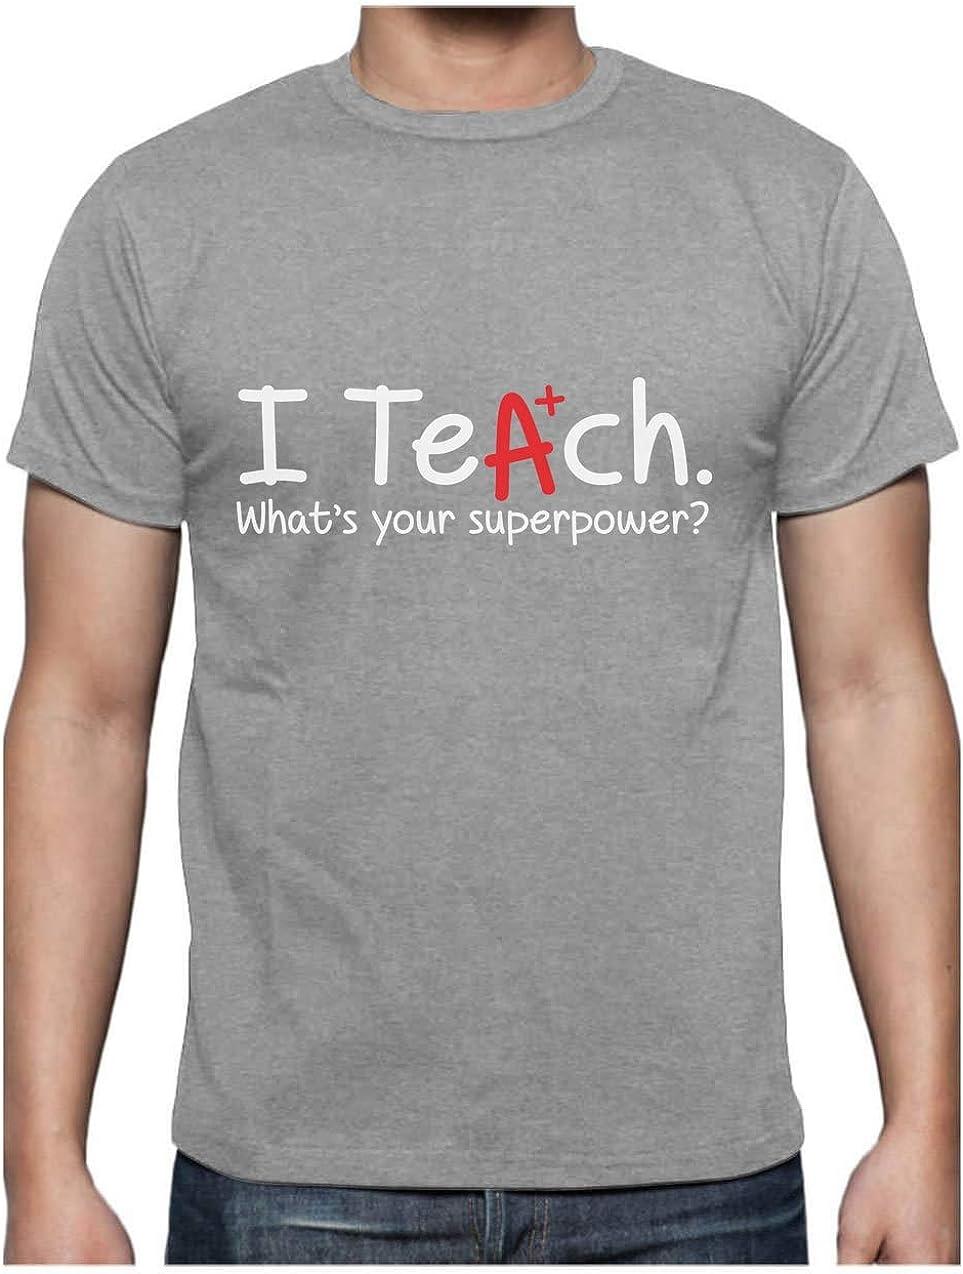 Green Turtle T-Shirts Camiseta para Hombre - Regalo para Profesor - I Teach Whats Your Superpower?